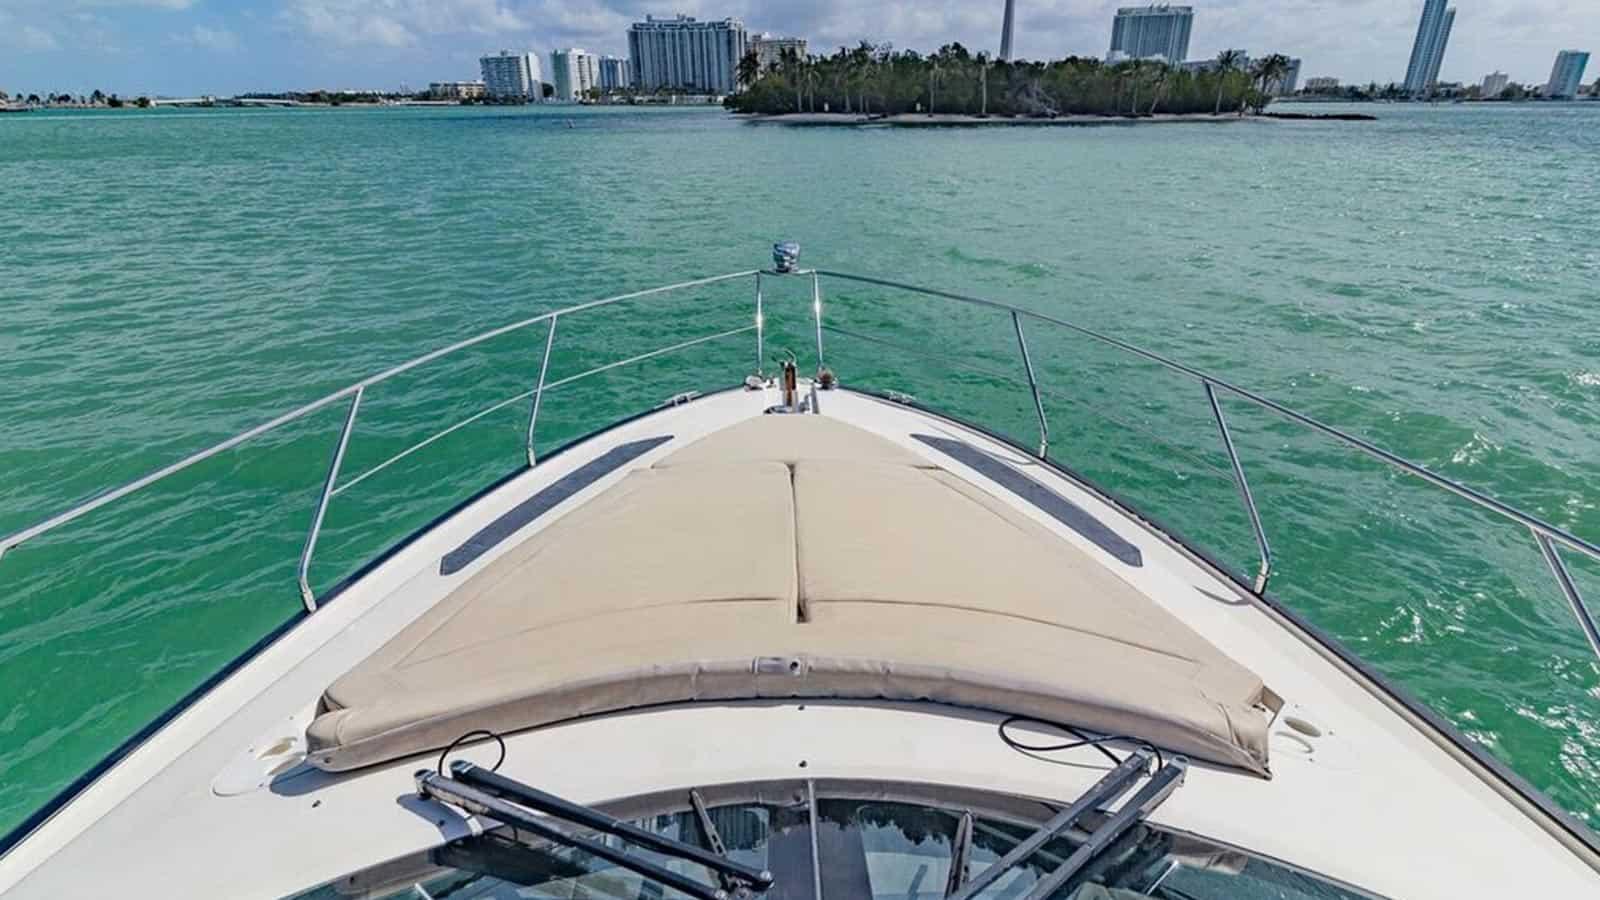 Boat Rental South Beach Miami